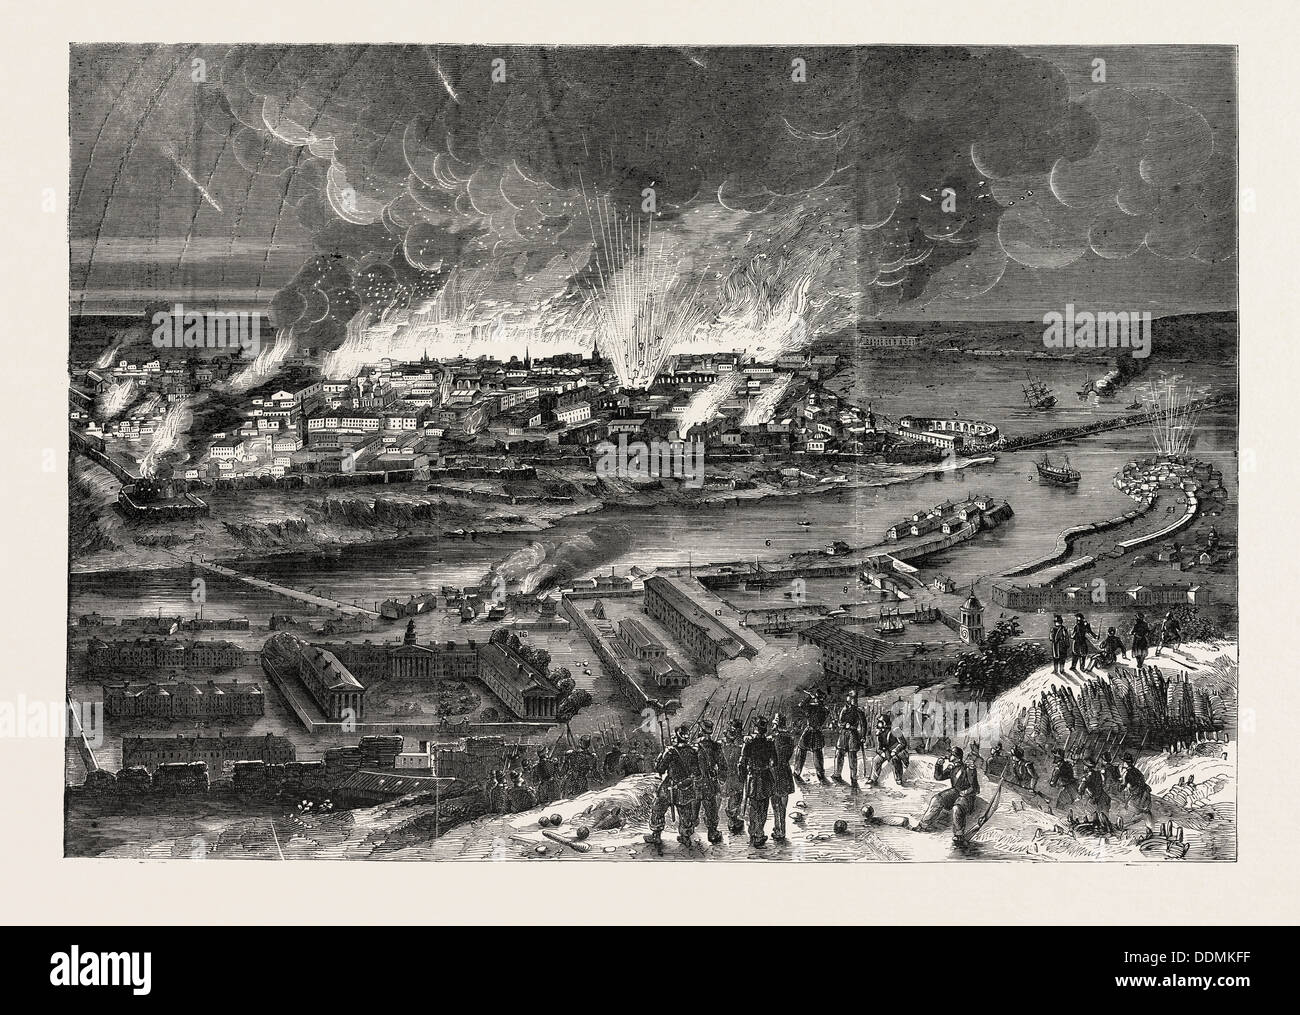 THE CRIMEAN WAR: CONFLAGRATION OF SEBASTOPOL, ON THE MORNING OF SEPTEMBER 9, 1855, FROM THE HEIGHT - Stock Image